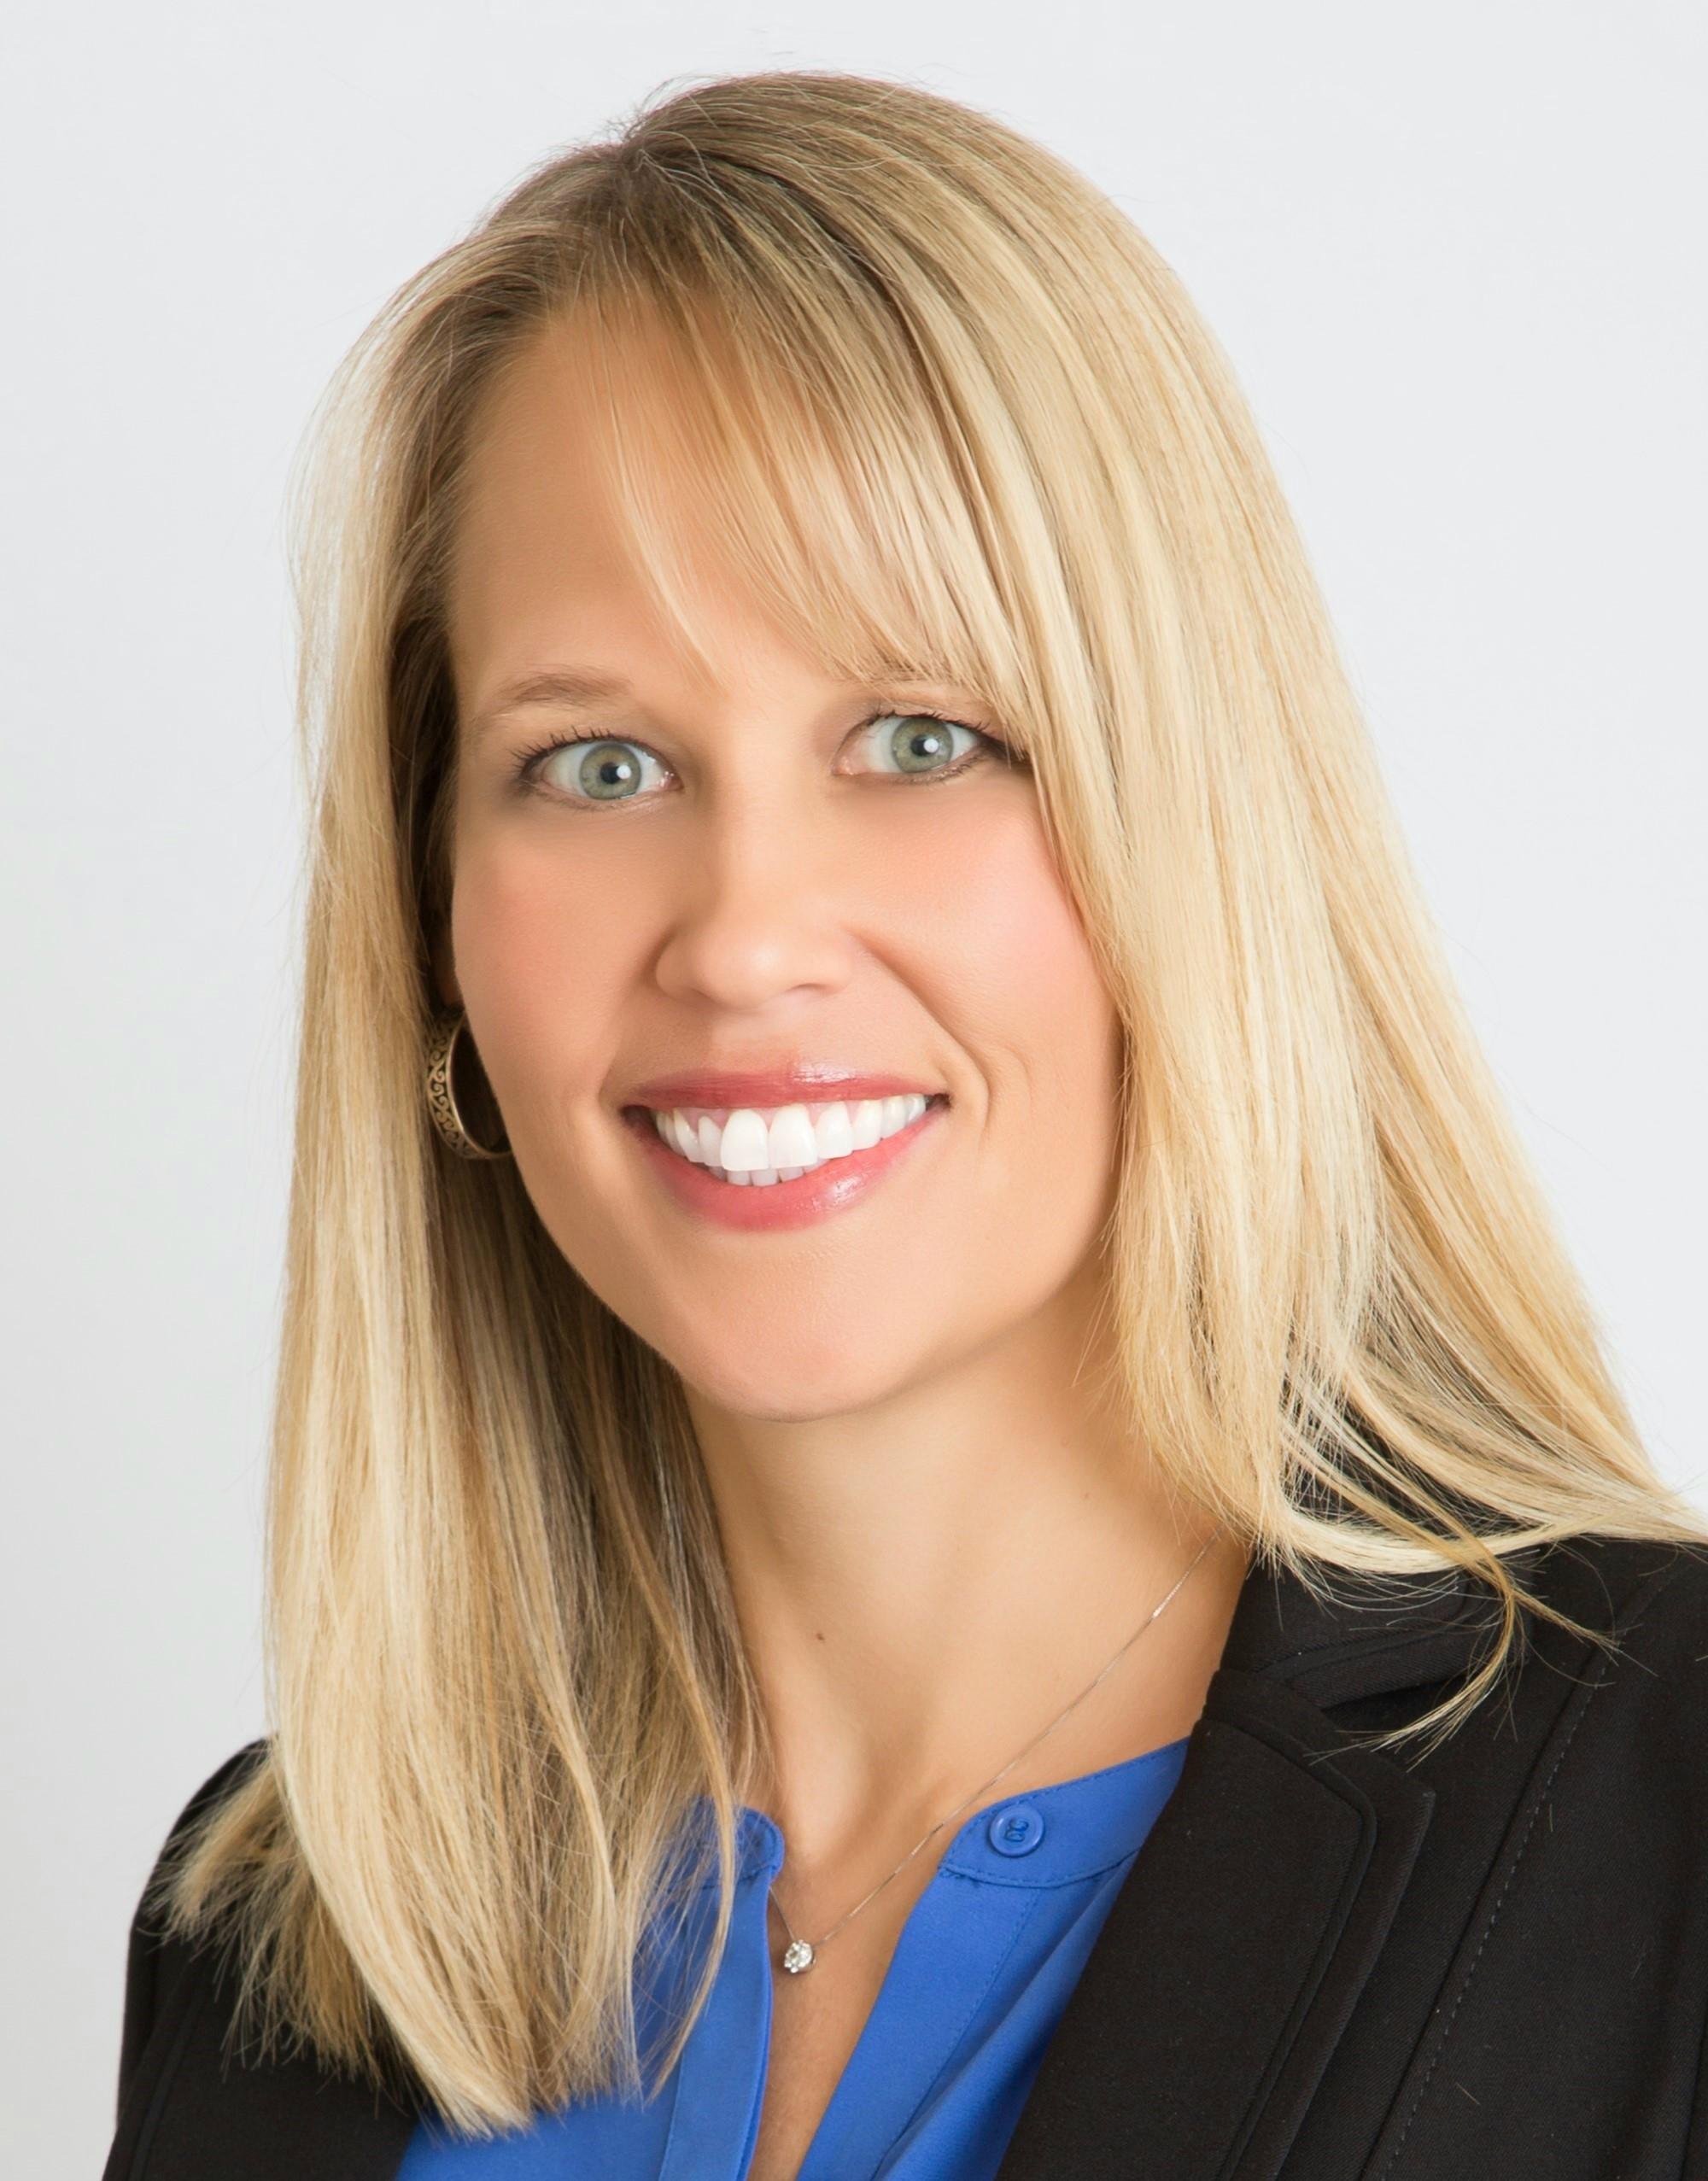 Kelli HIldebrand on professional legacy